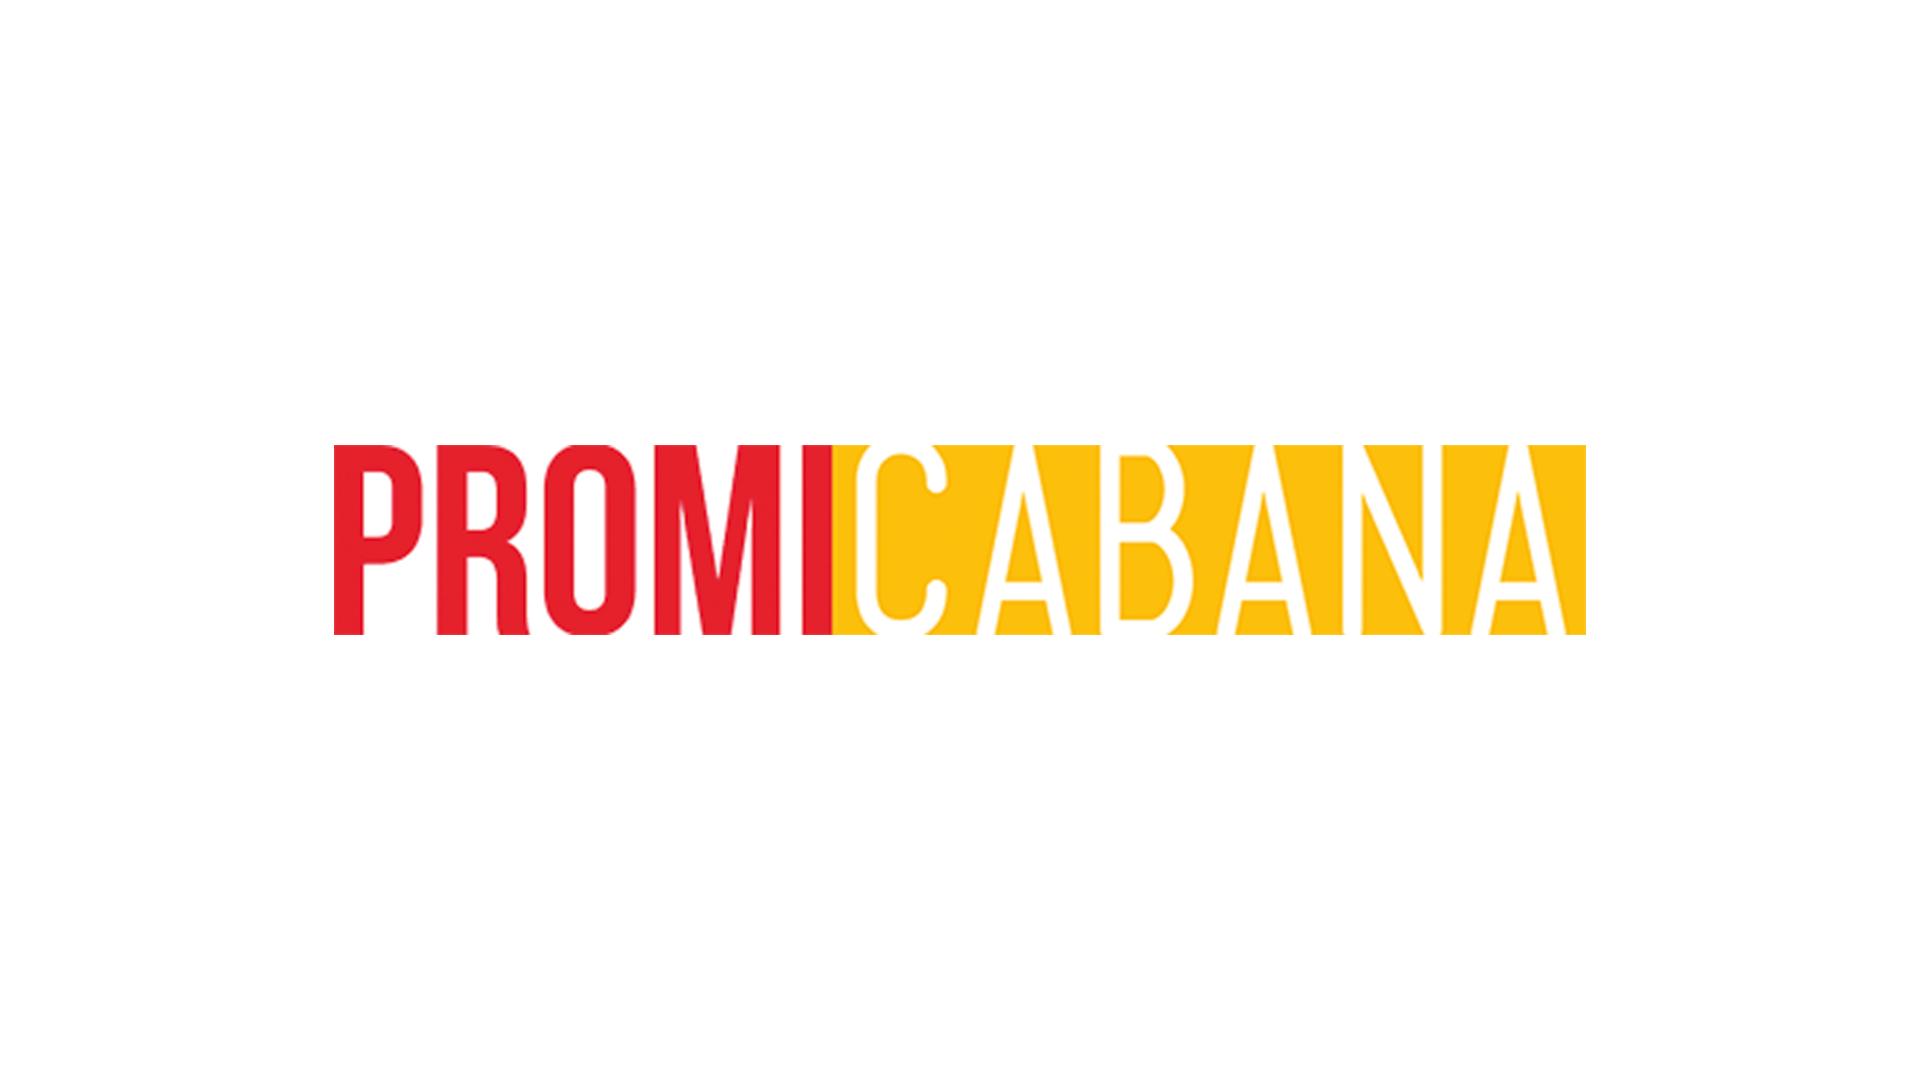 The-Muppets-Trailer-Jason-Segal